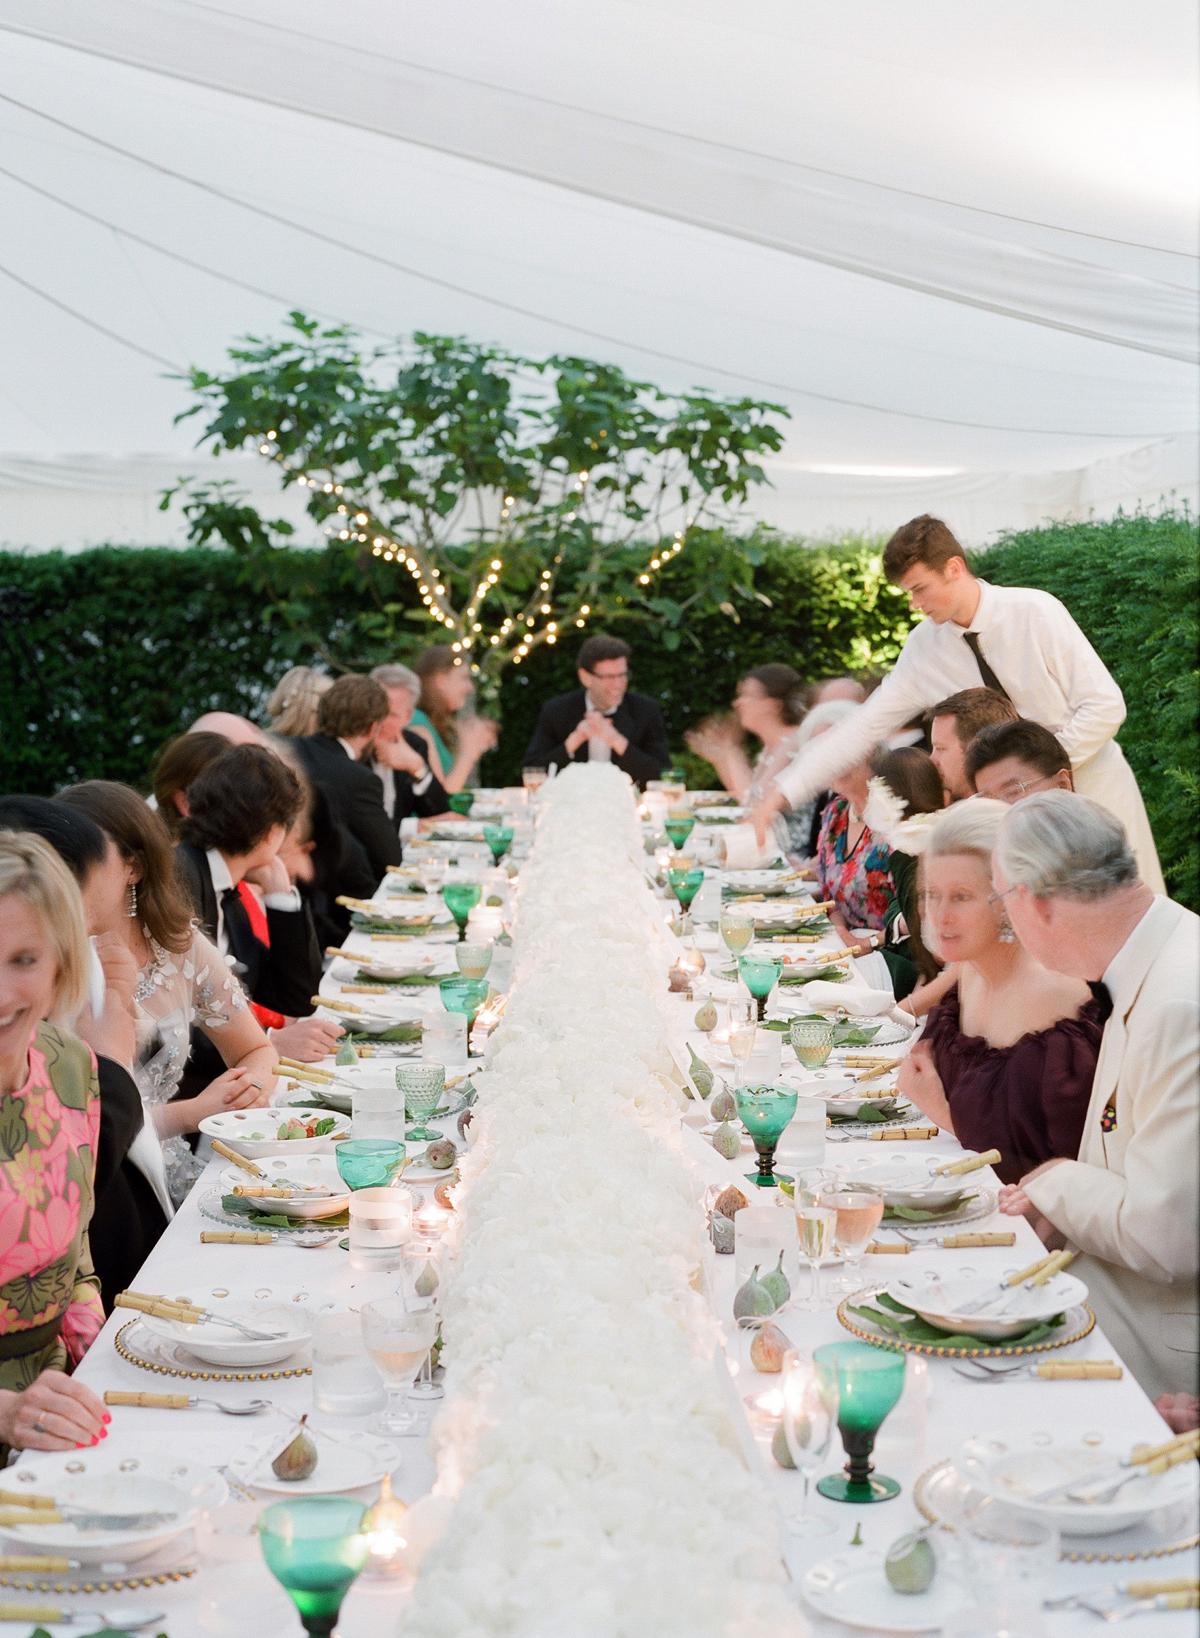 peony matthew england wedding reception dining table